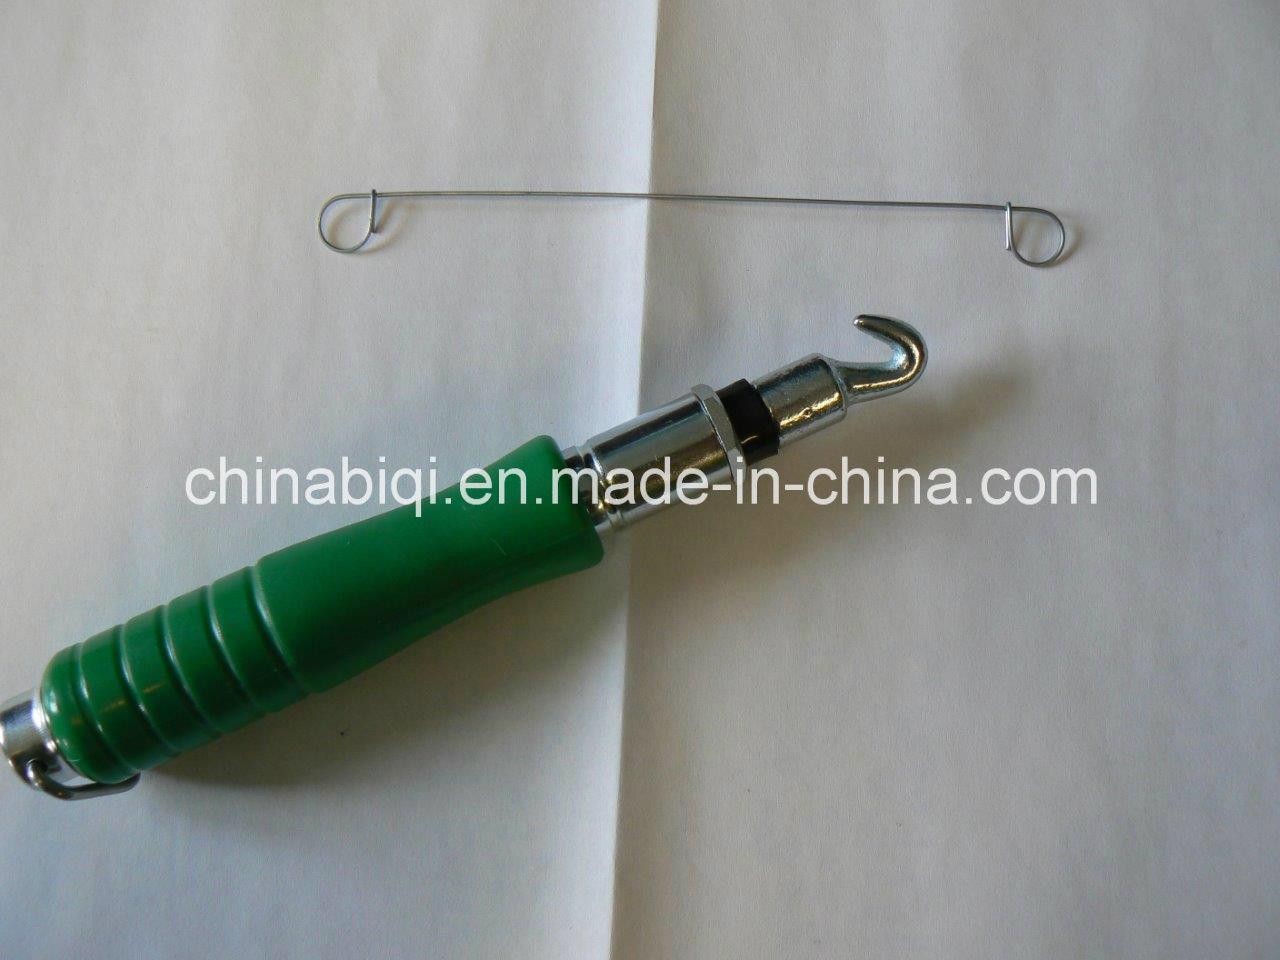 Rebar Tie Wire Twister - Dolgular.com